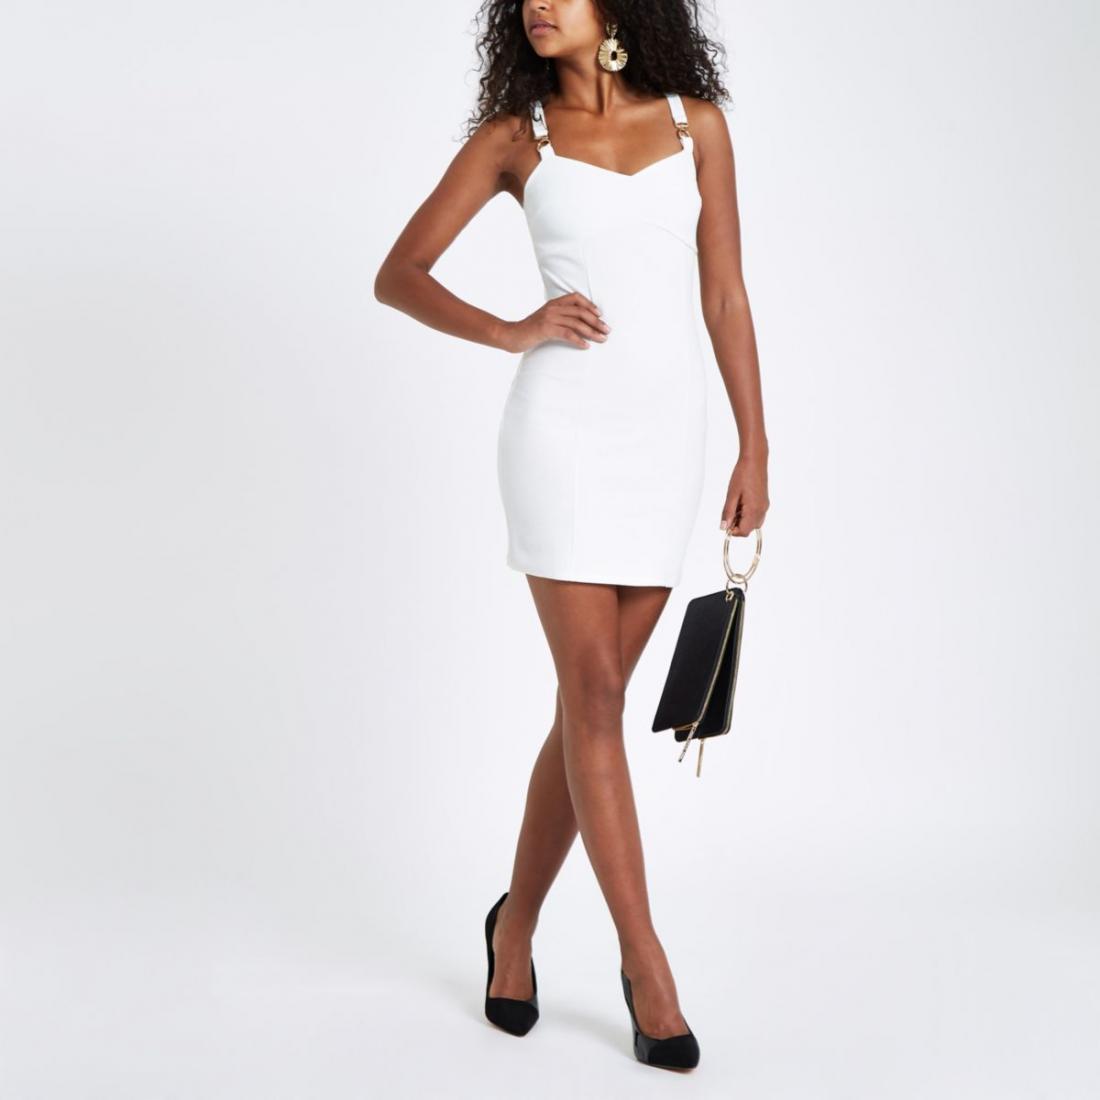 Femme en mini robe moulante